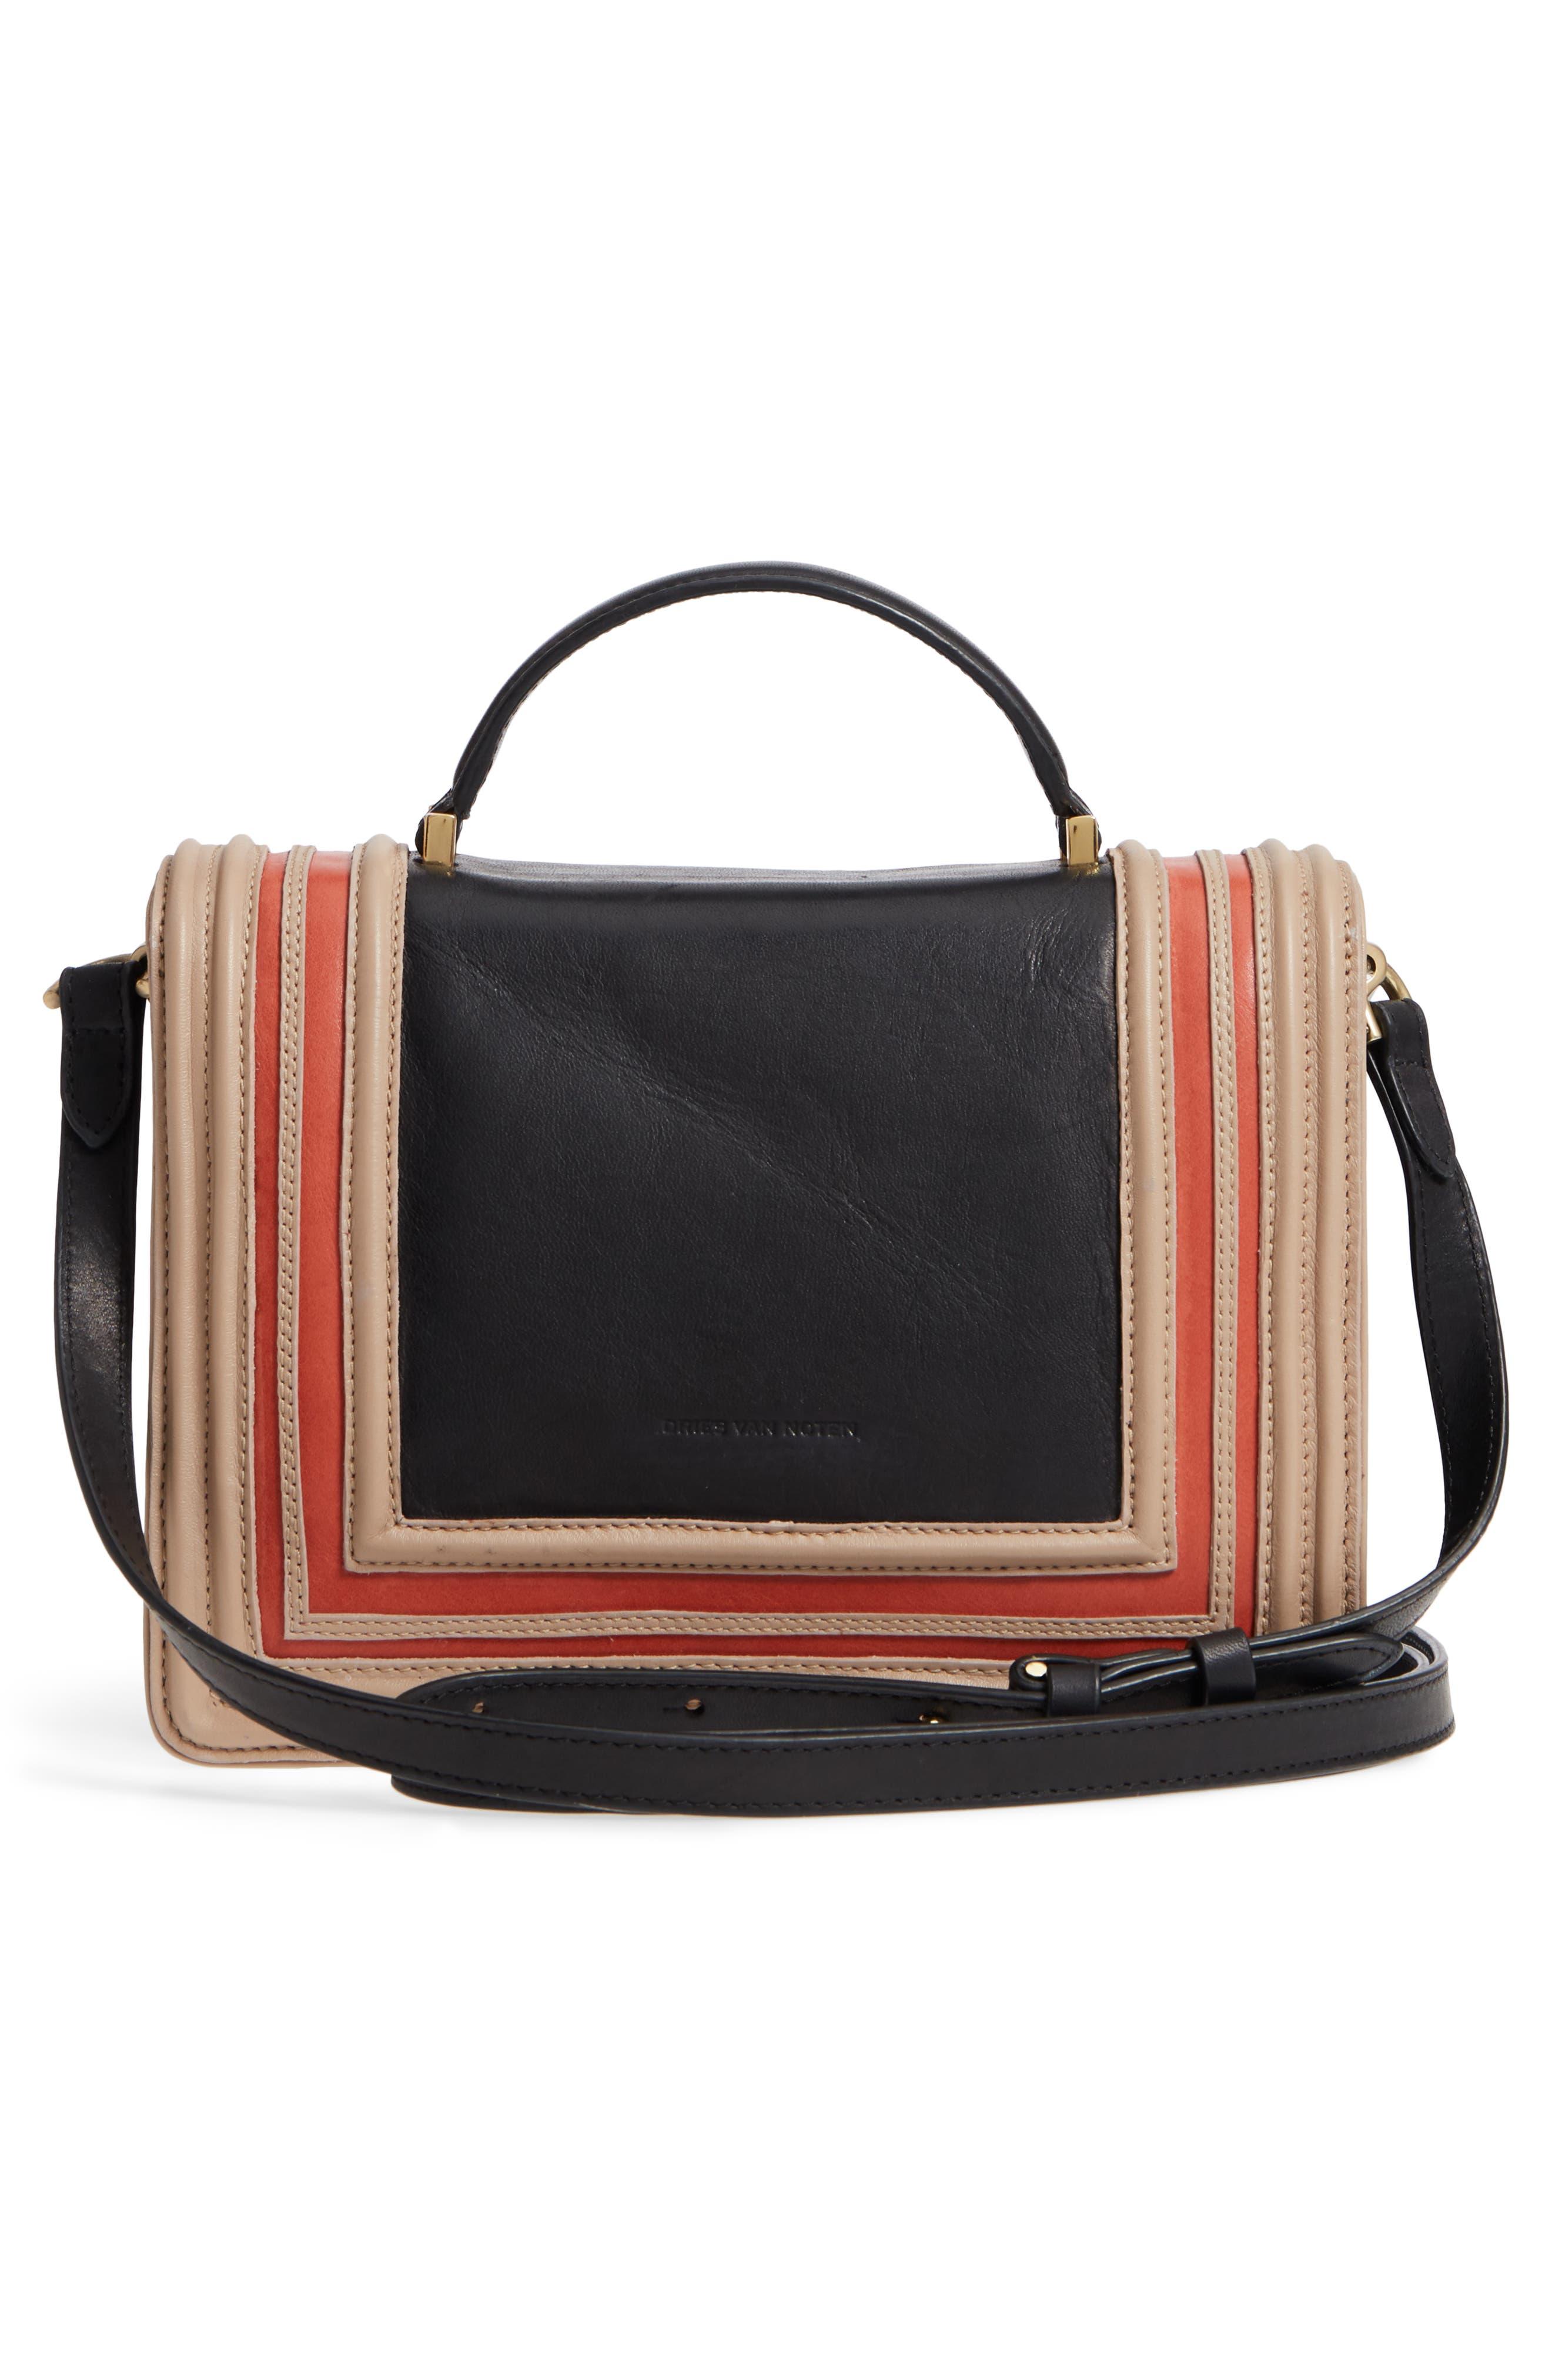 Small Square Top Handle Handbag,                             Alternate thumbnail 3, color,                             Black